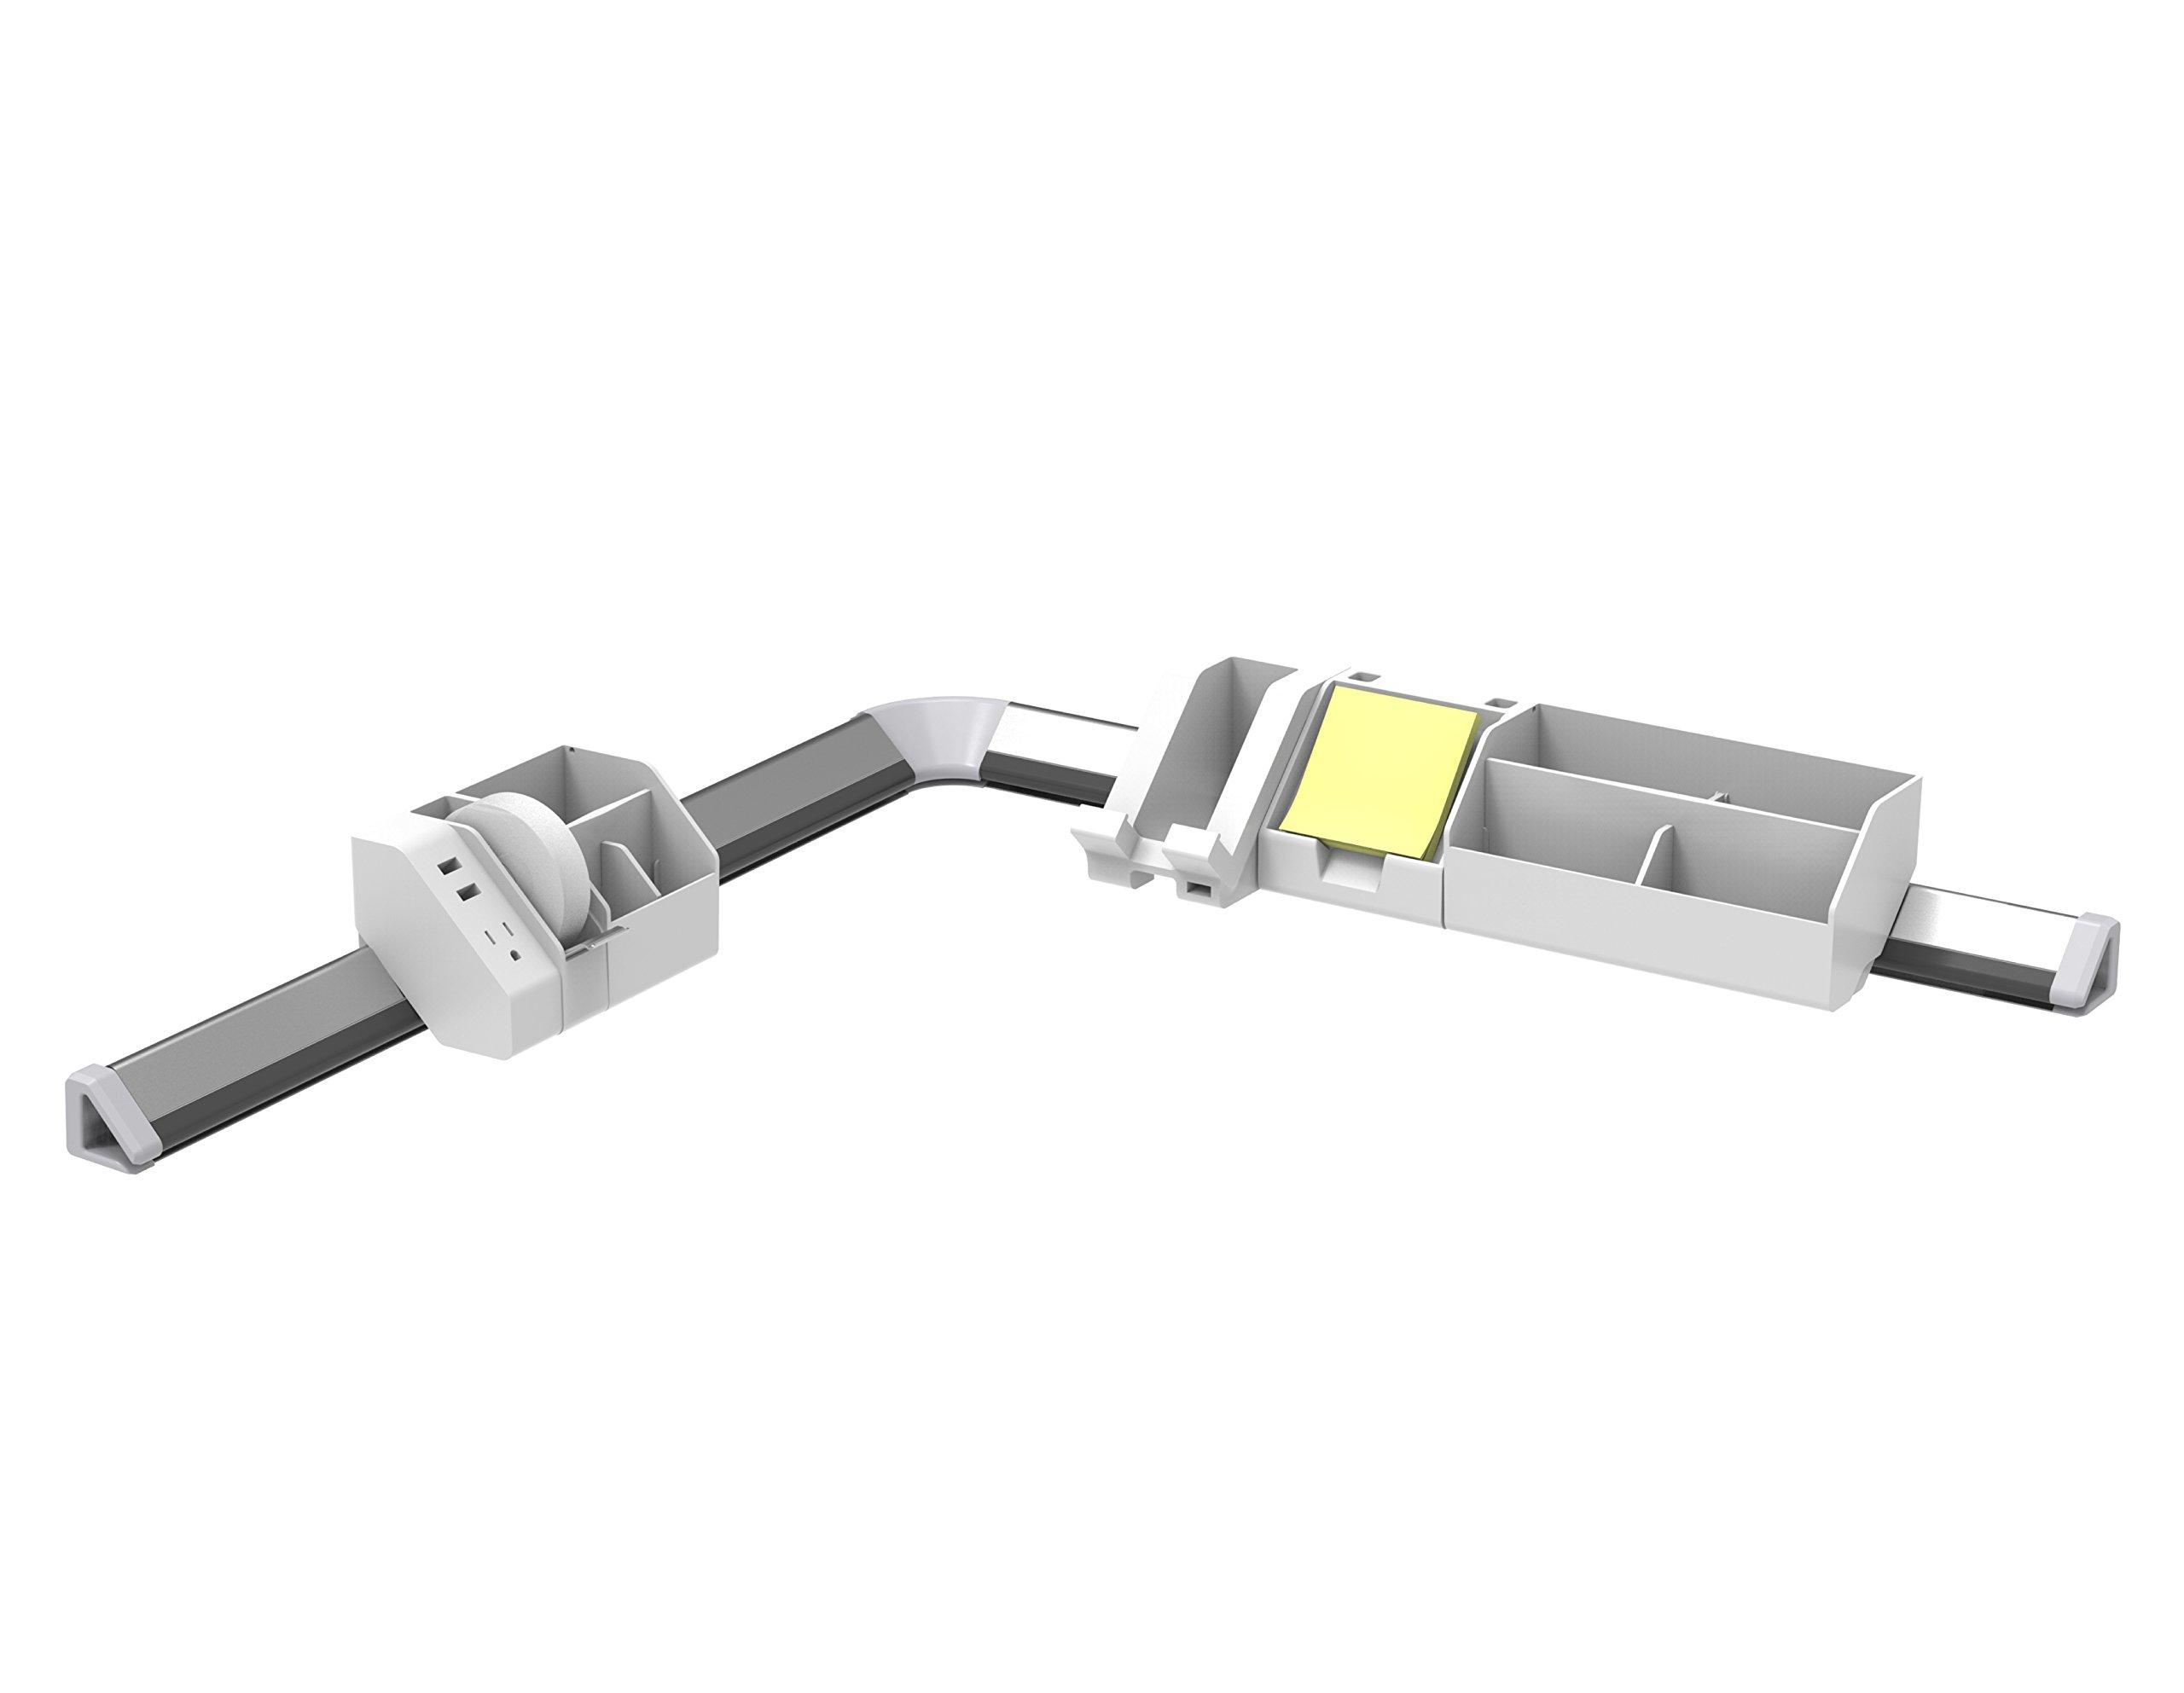 Bostitch Konnect 12-Piece Desktop Organizer Kit, Includes Cable Management Rails, Power Hub, Charging Phone Dock, Tape Dispenser, Sticky Notes, Storage Bins, White (KT-CKIT3-WHITE)